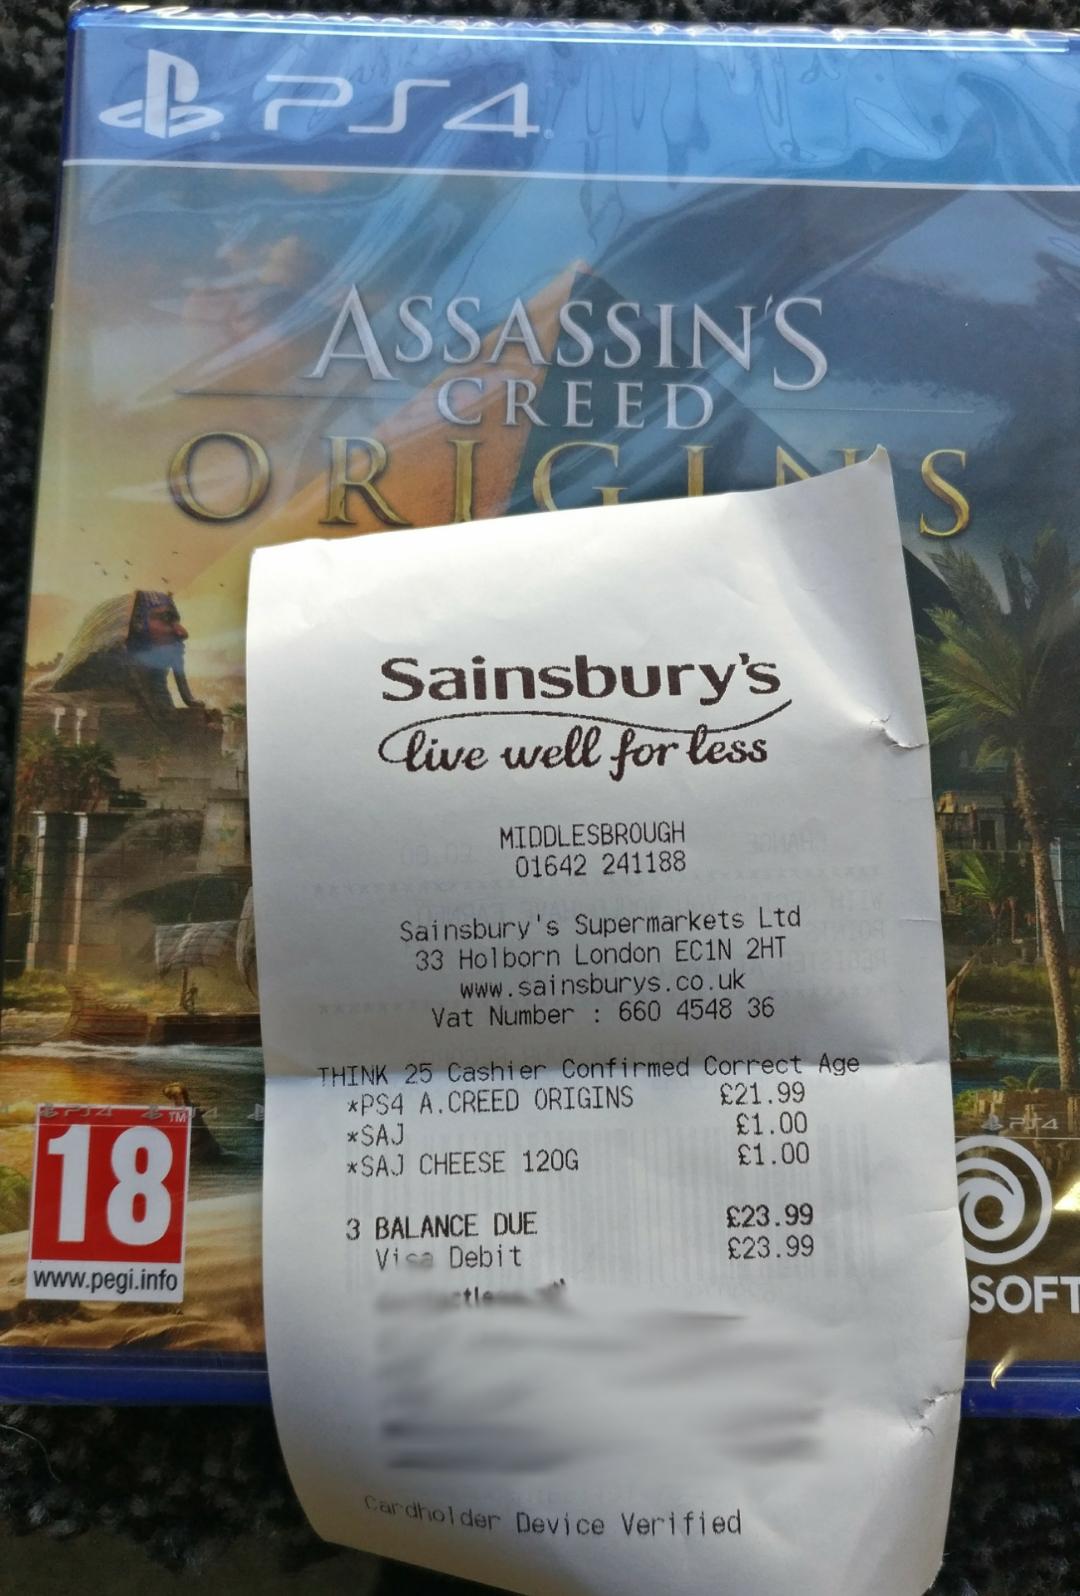 Assassins Creed Origins PS4 - Sainsbury's £21.99 instore